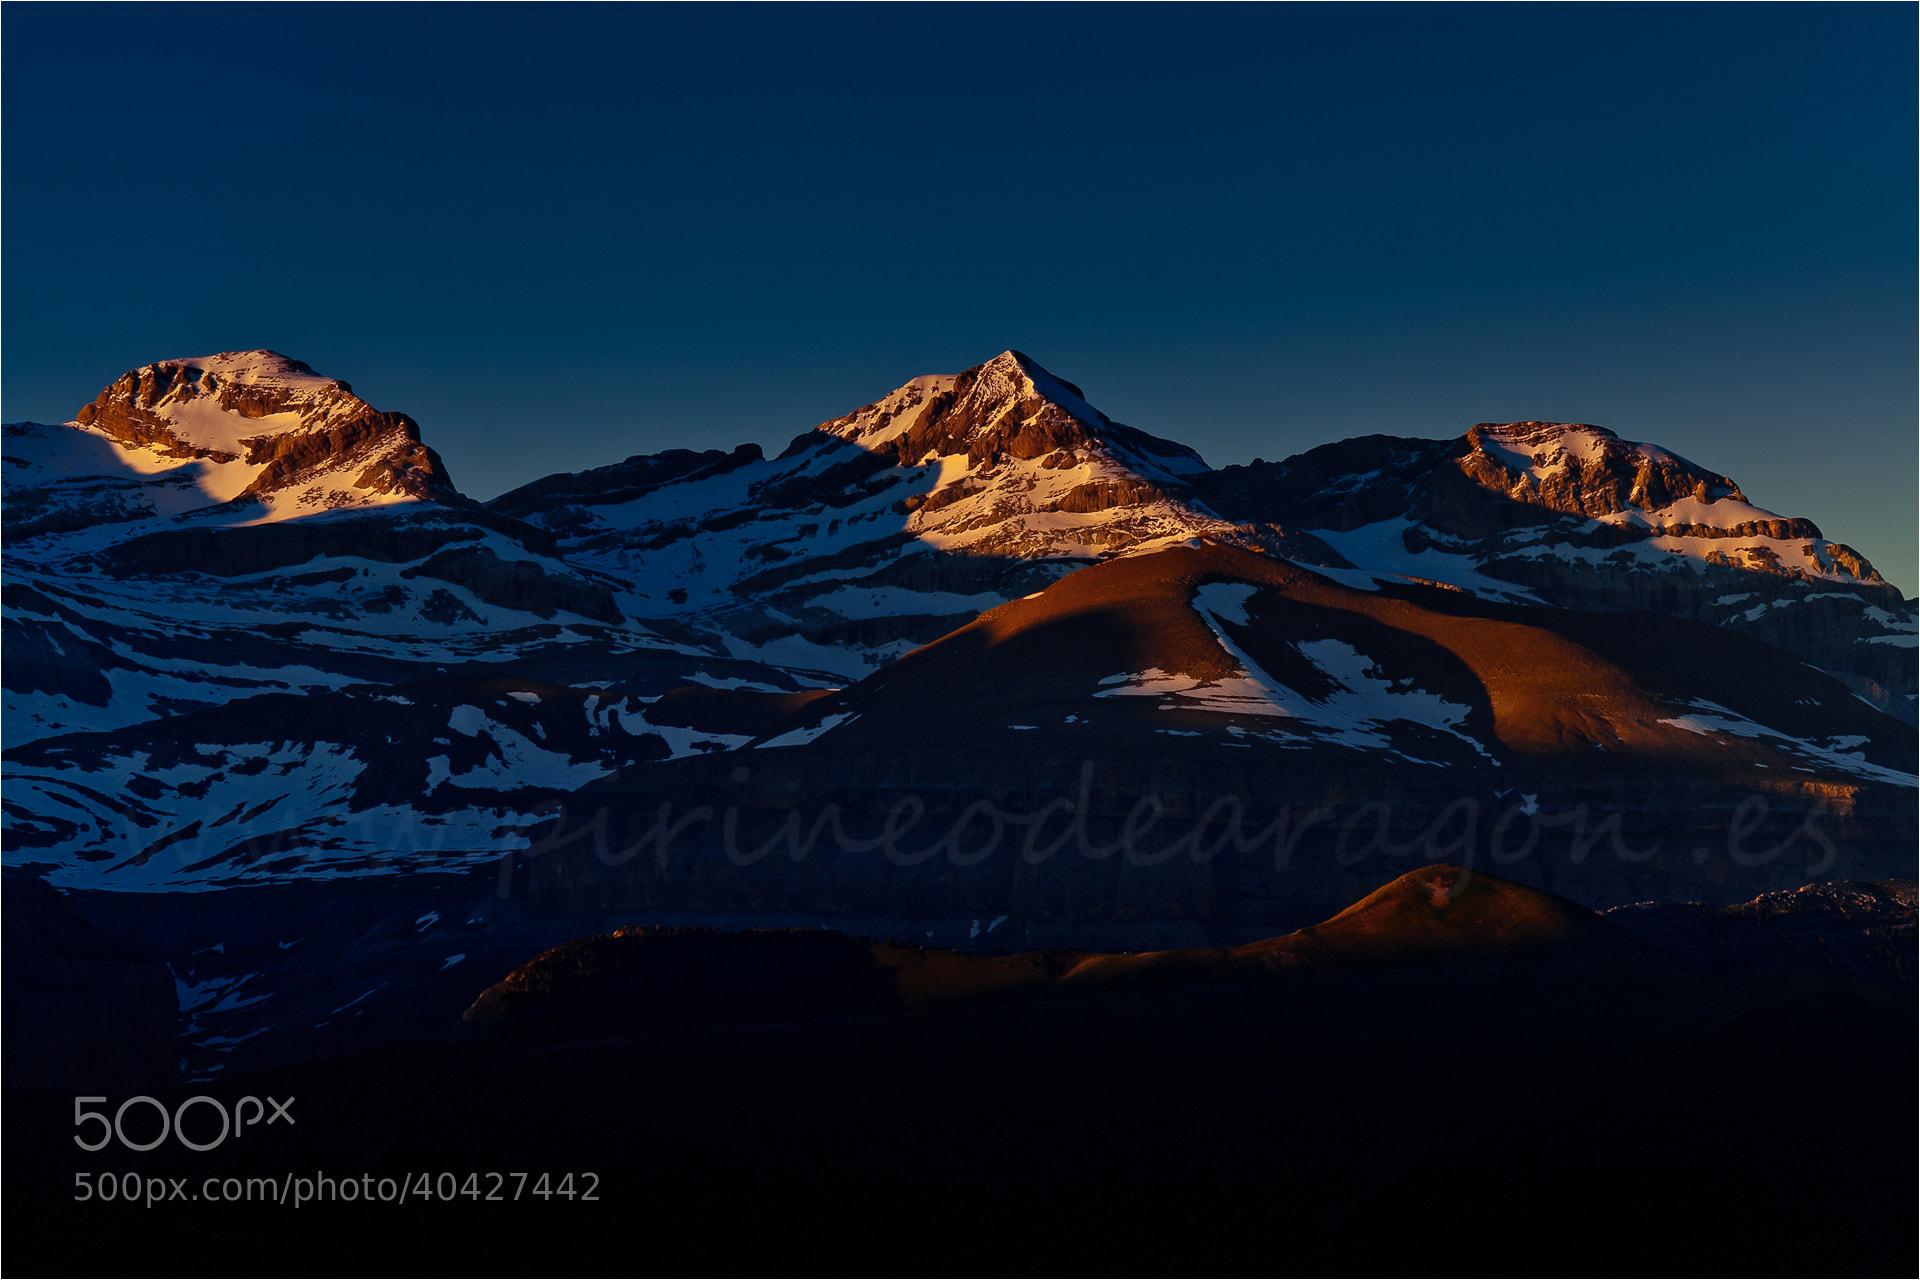 Photograph Monte Perdido (Huesca) by Ferran Cartagena  on 500px